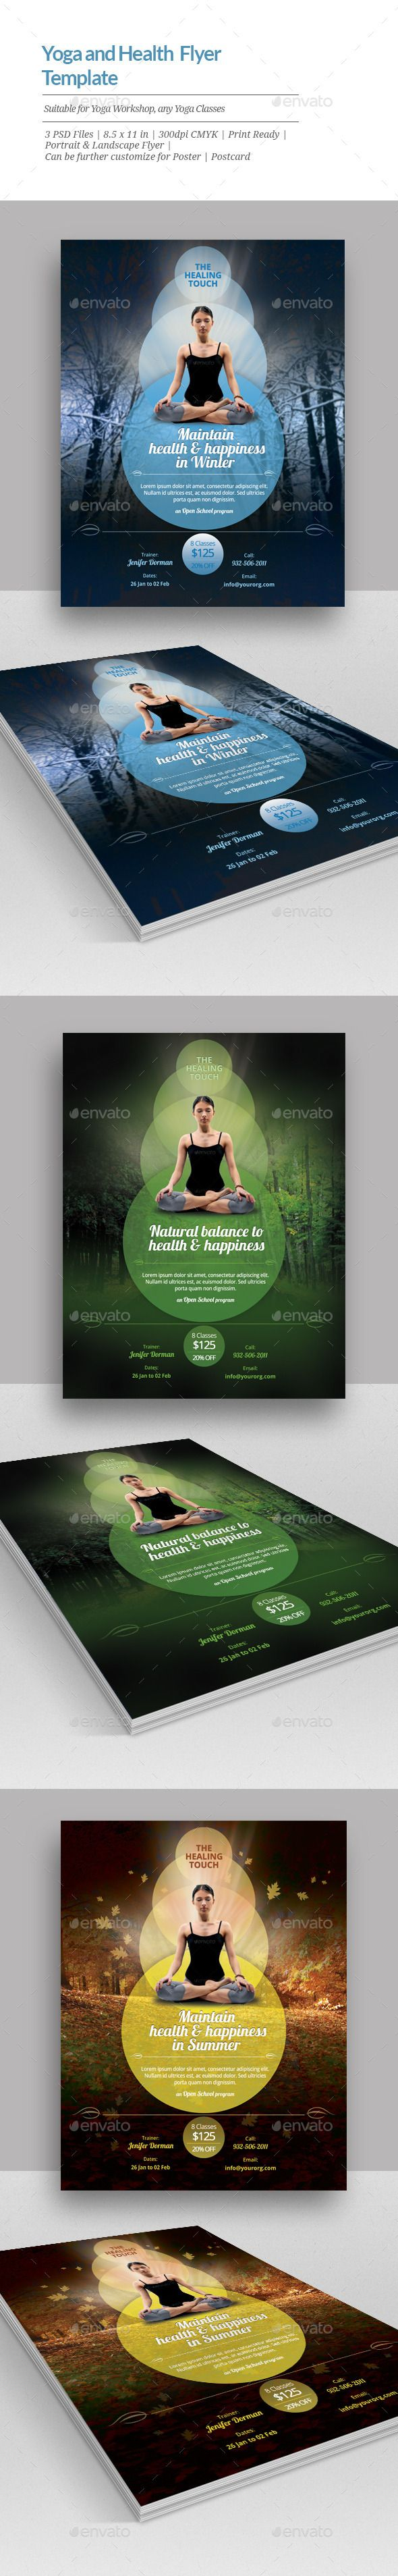 Yoga and Health Flyer Templates | Werbung und Magazin